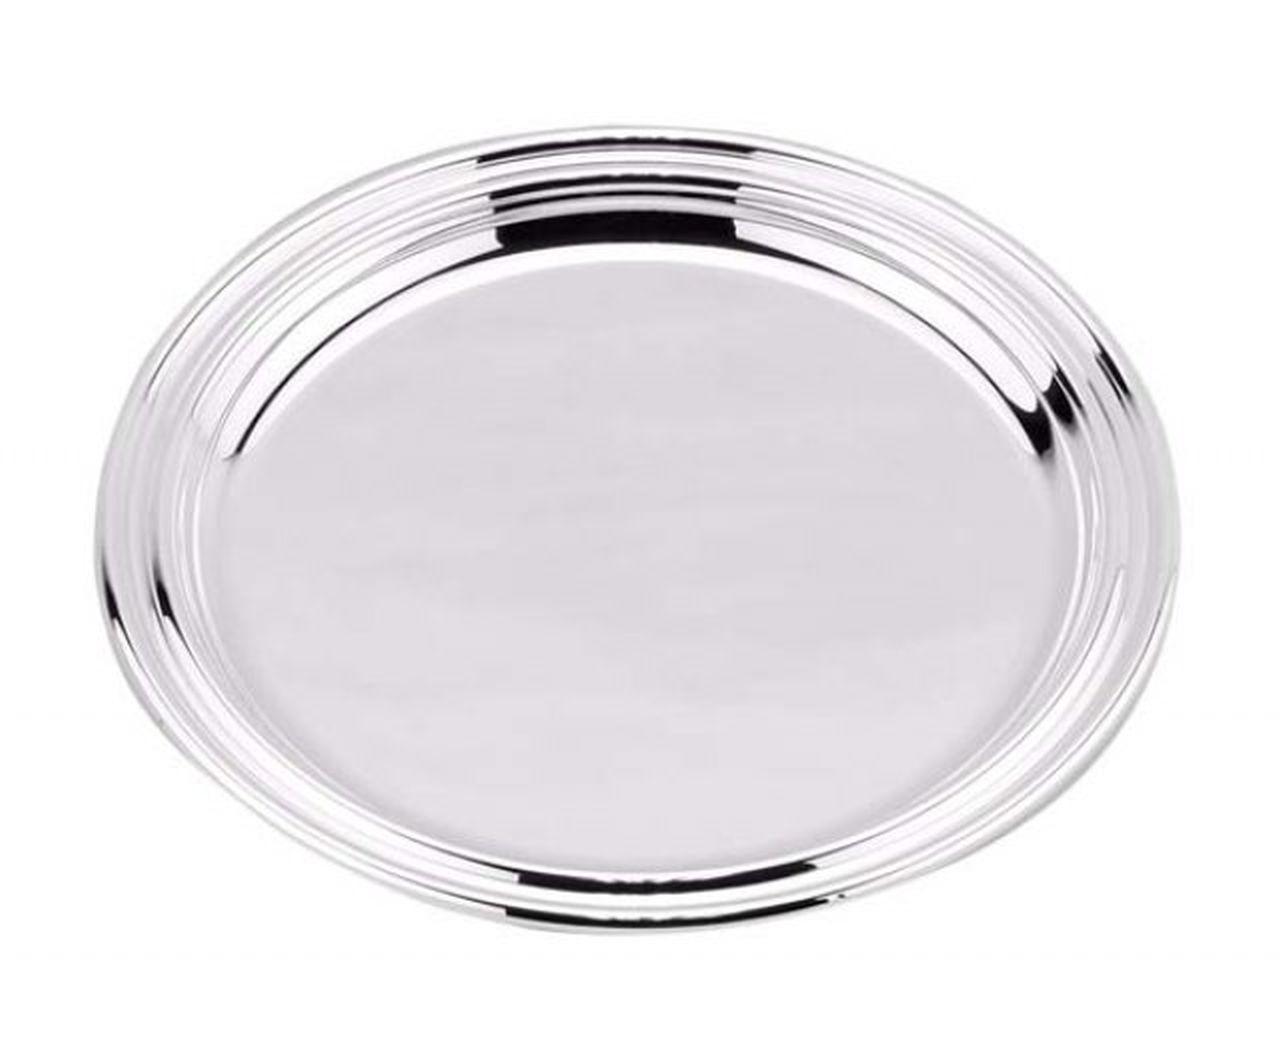 Sottopane silver plated stile Inglese cm.1,5h diam.14